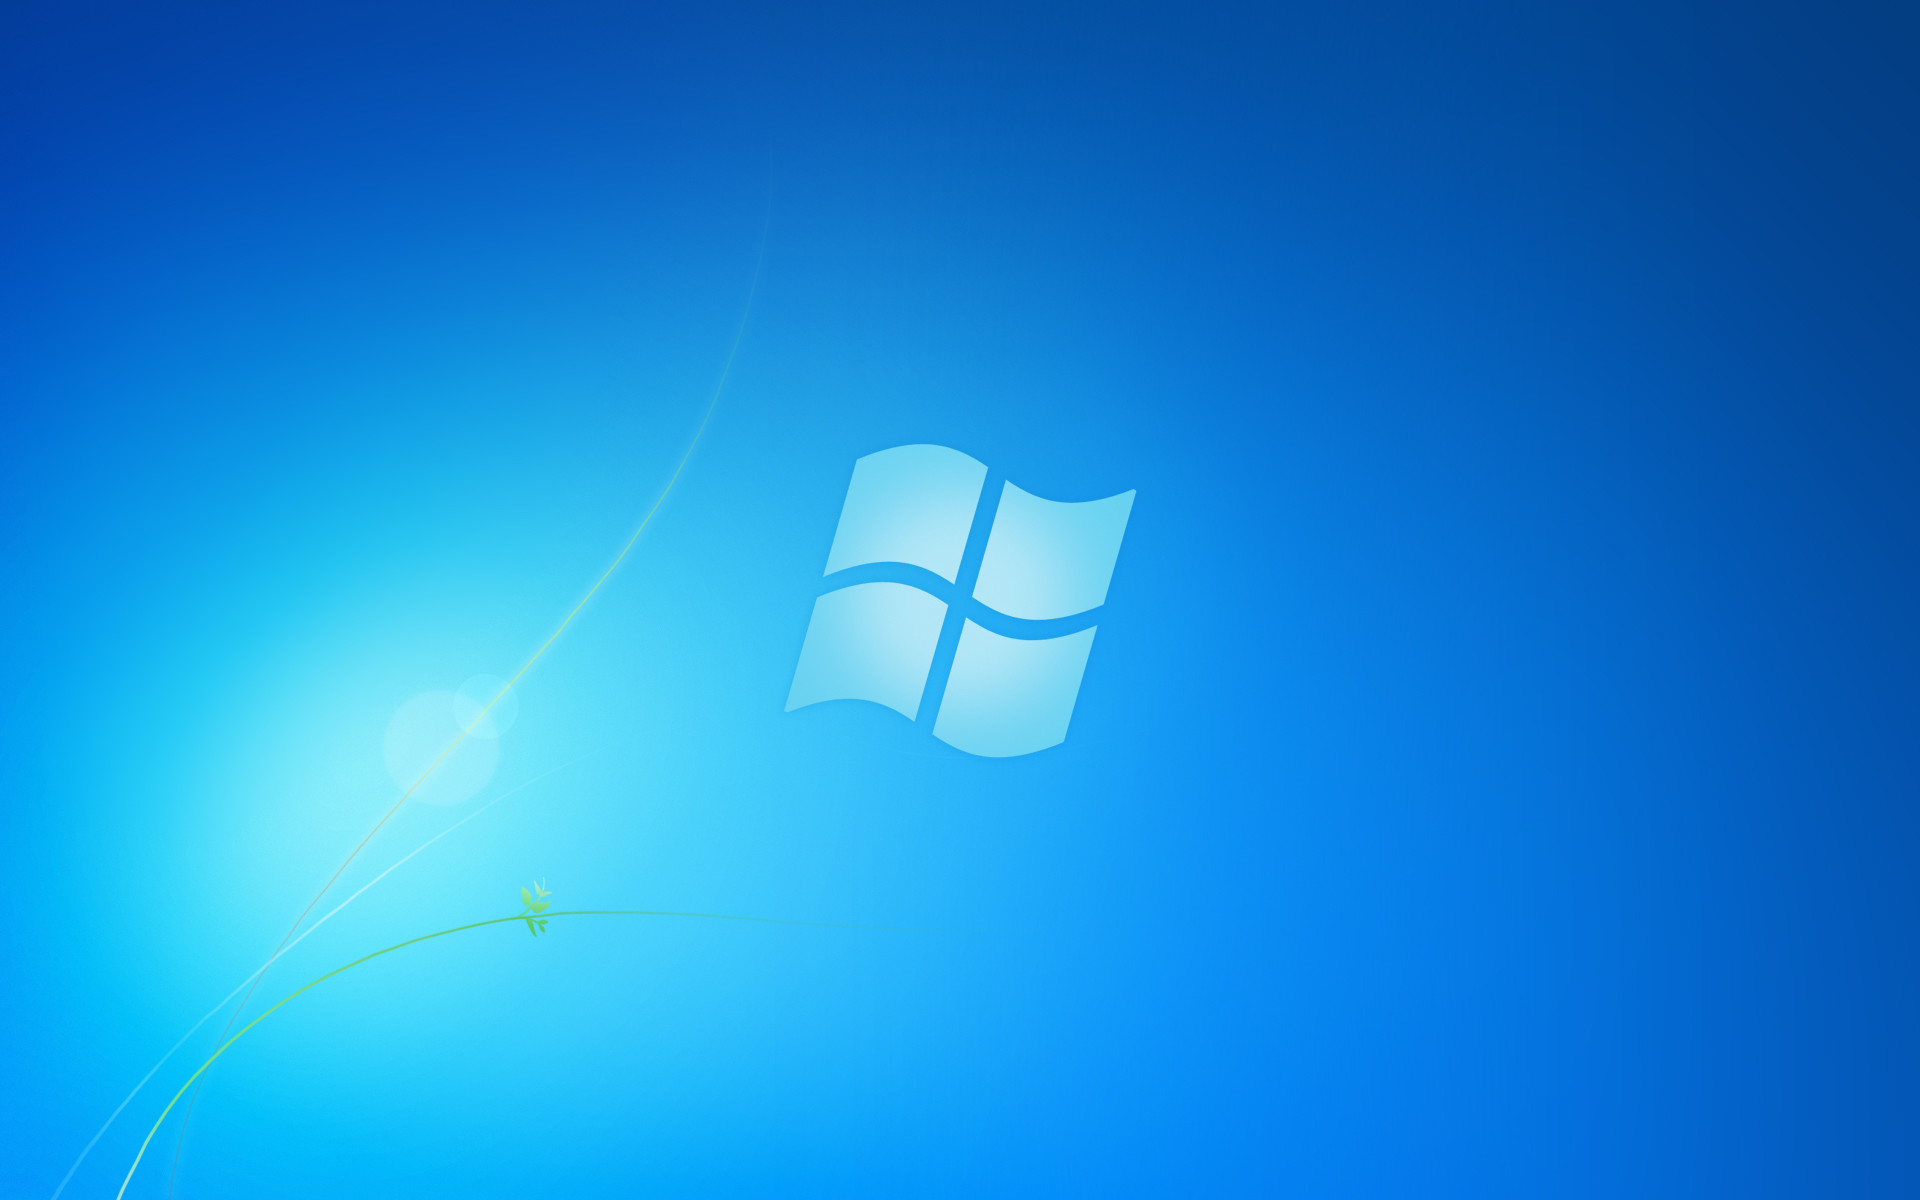 windows 7 starter personalize download